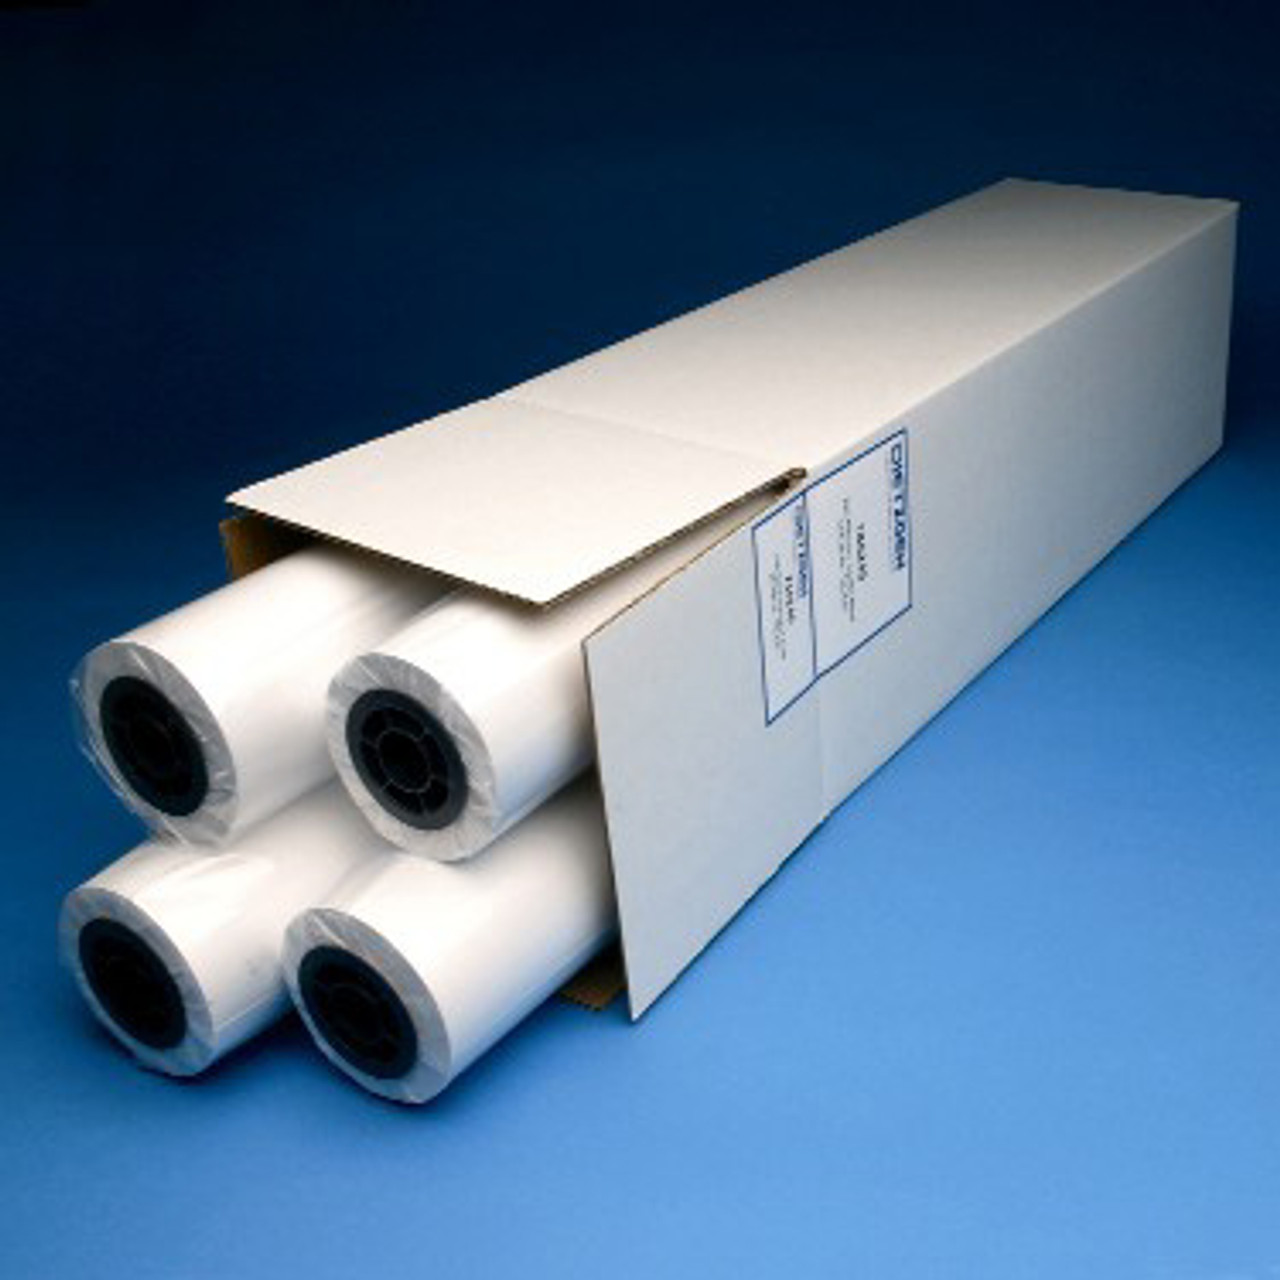 "4 rolls 30/"" x 150/' 20lb Bond Plotter Paper for Wide Format Inkjet Printers"